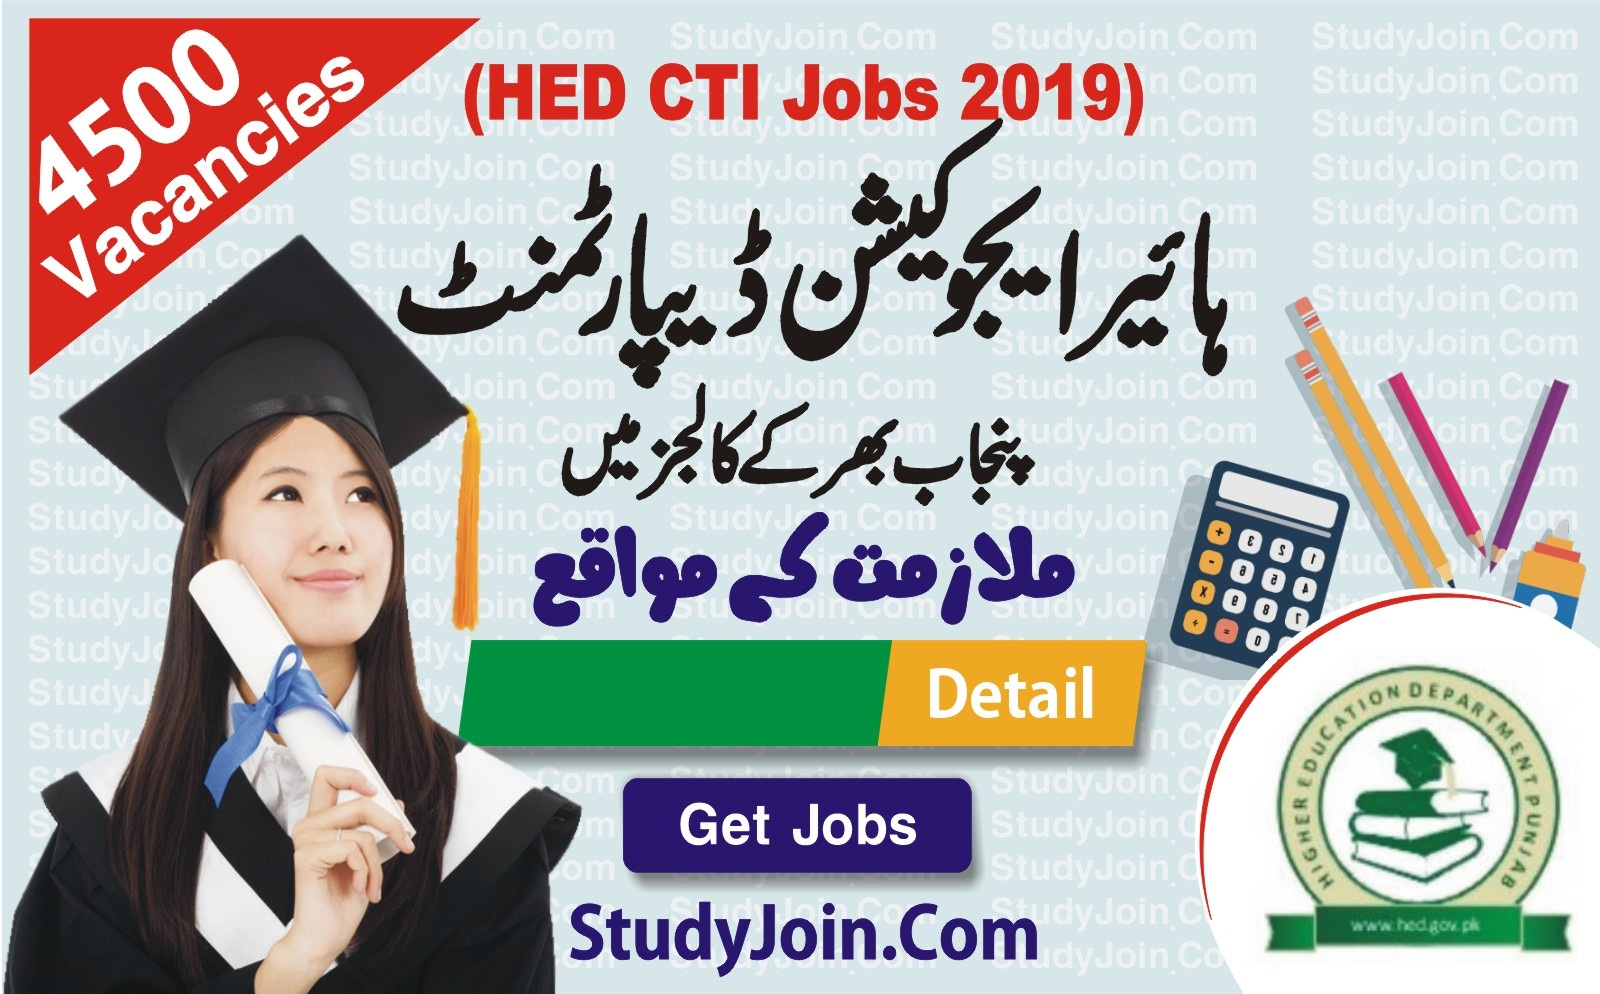 cti jobs in punjab 2019, Punjab Higher Education Department,Punjab Educators, PPSC Lecturers, SS, CTI Updates 2019,paperpk,paperpk4u,paperpk jobs 2019,paperpk tenders,ilm ki dunya jobs,jobs in pakistan,jobsbank,mustaqbil,careerjoin,jobsbank in pakistan,vulearning,jobsalert,latest jobs in pakistan,jobs in pakistan newspapers,ROZEE.PK